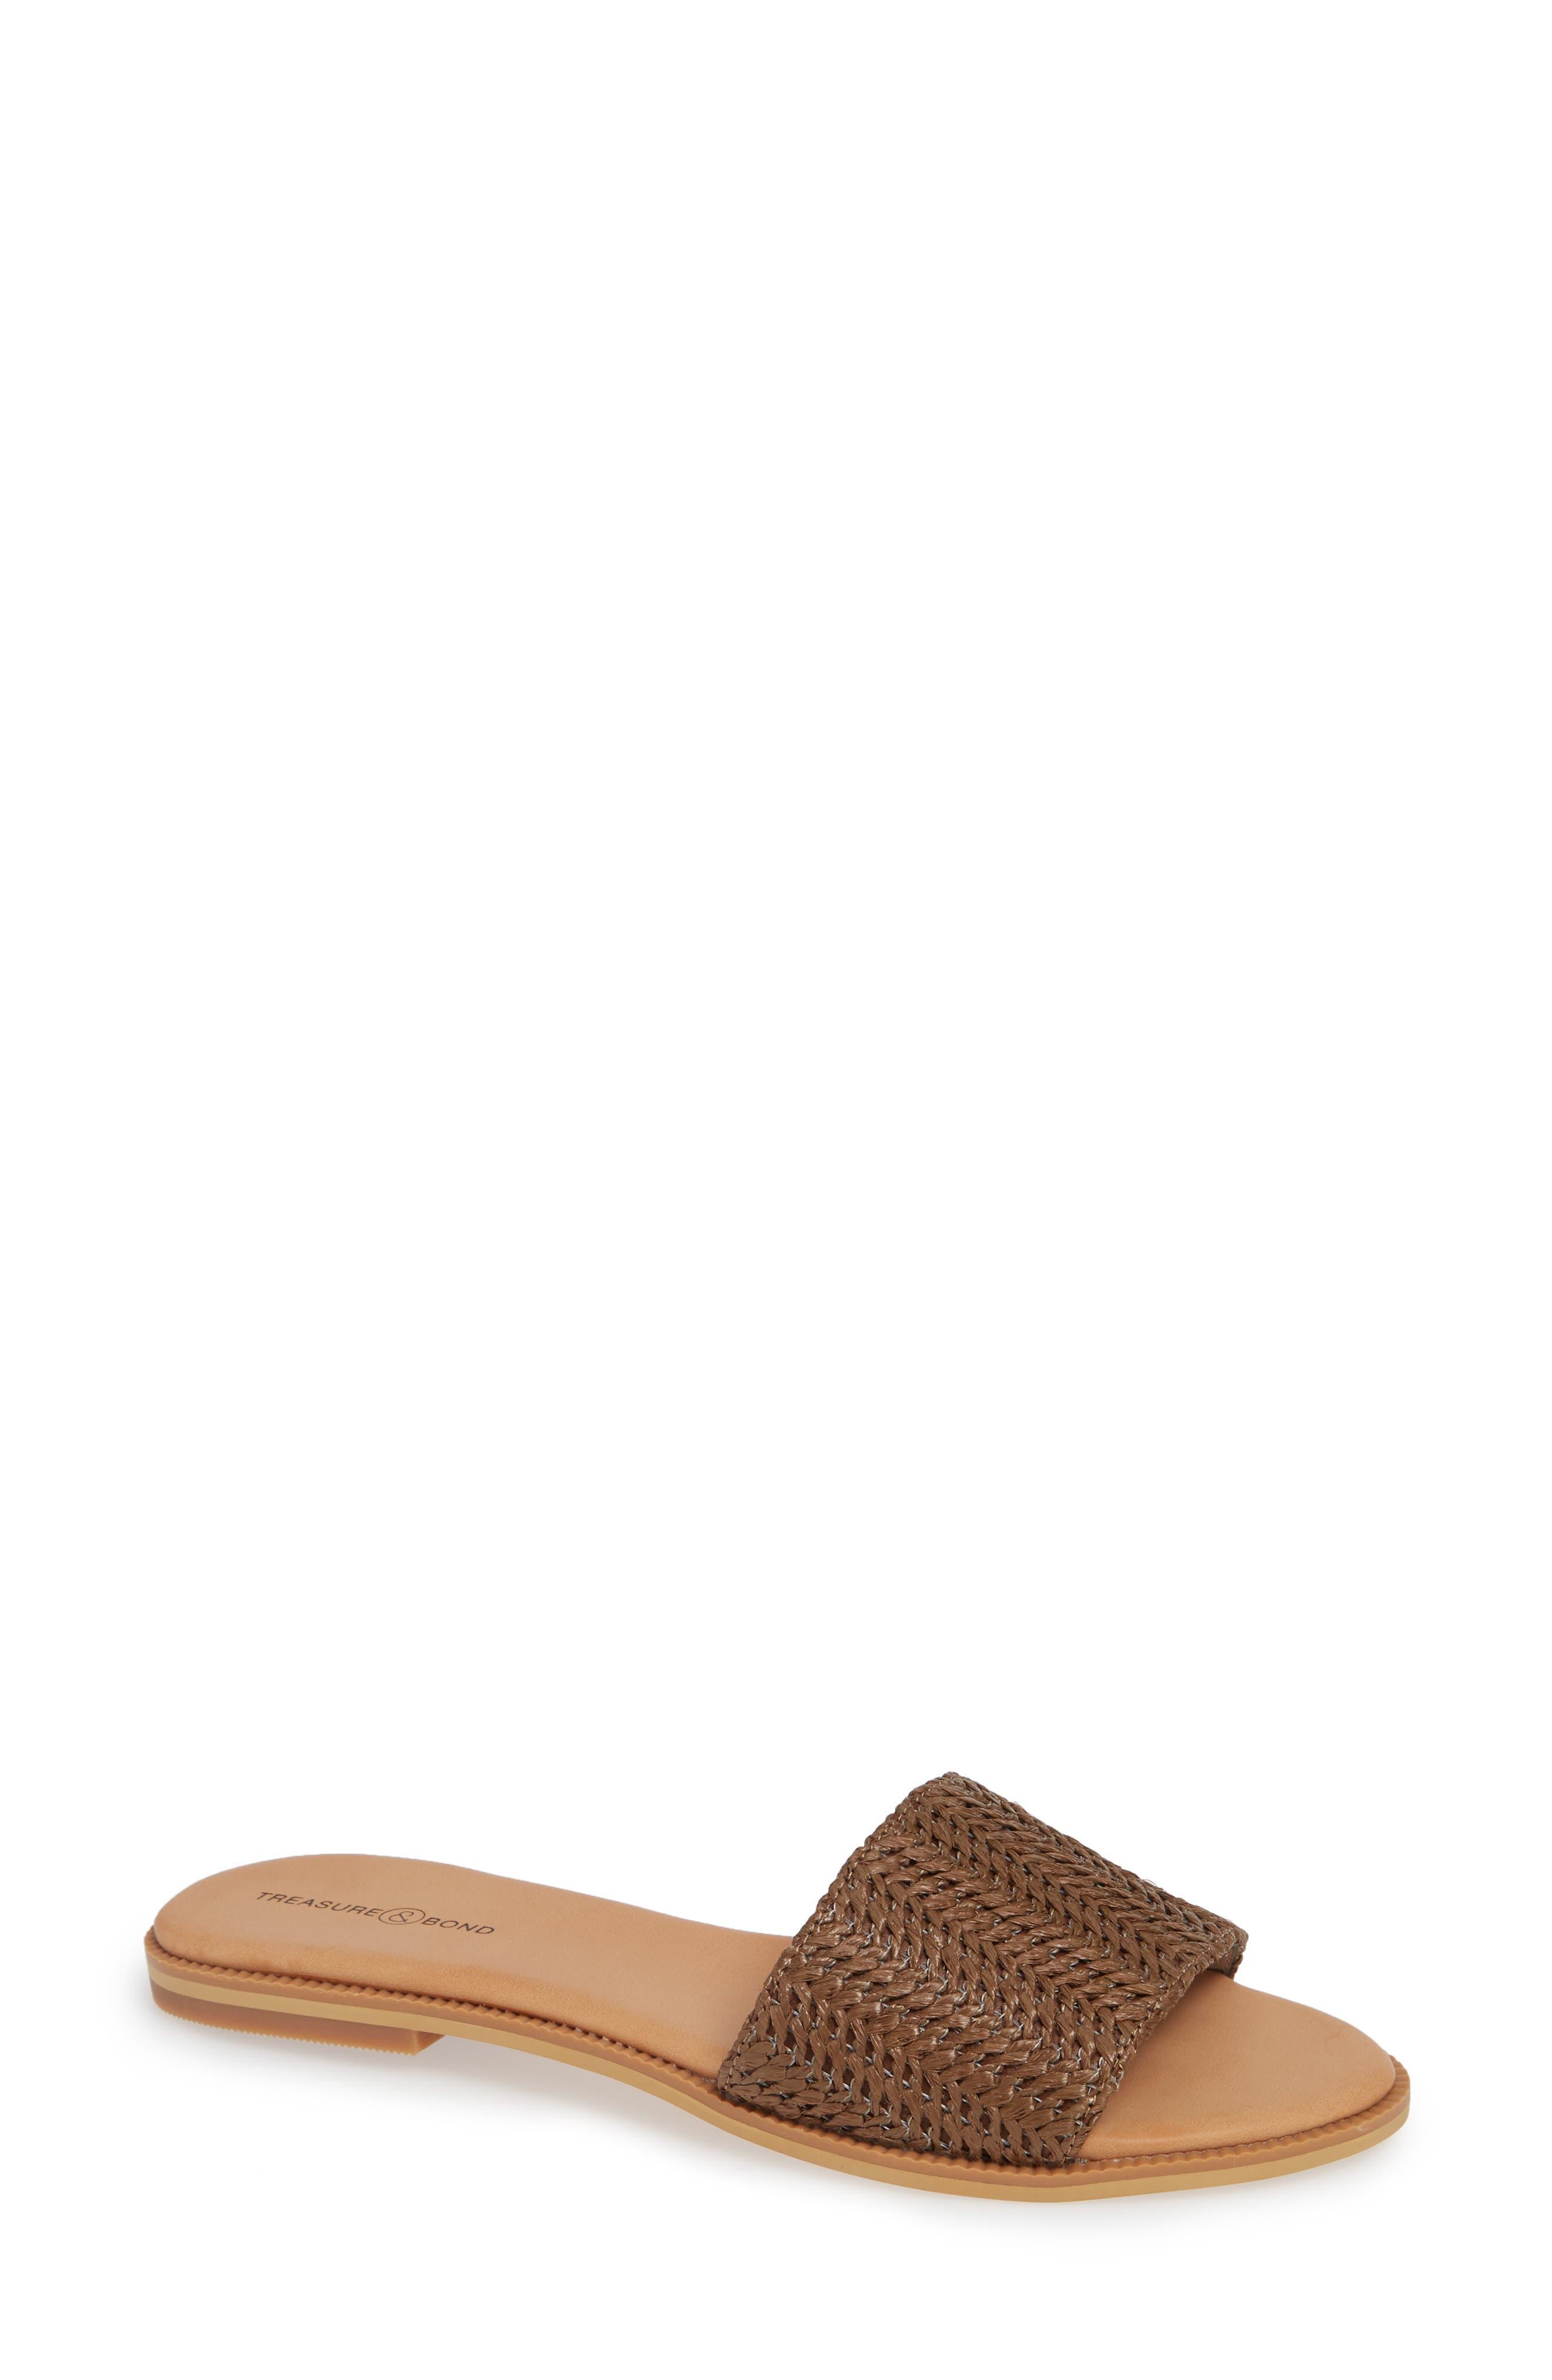 Mere Flat Slide Sandal,                             Main thumbnail 1, color,                             BROWN FAUX RAFFIA